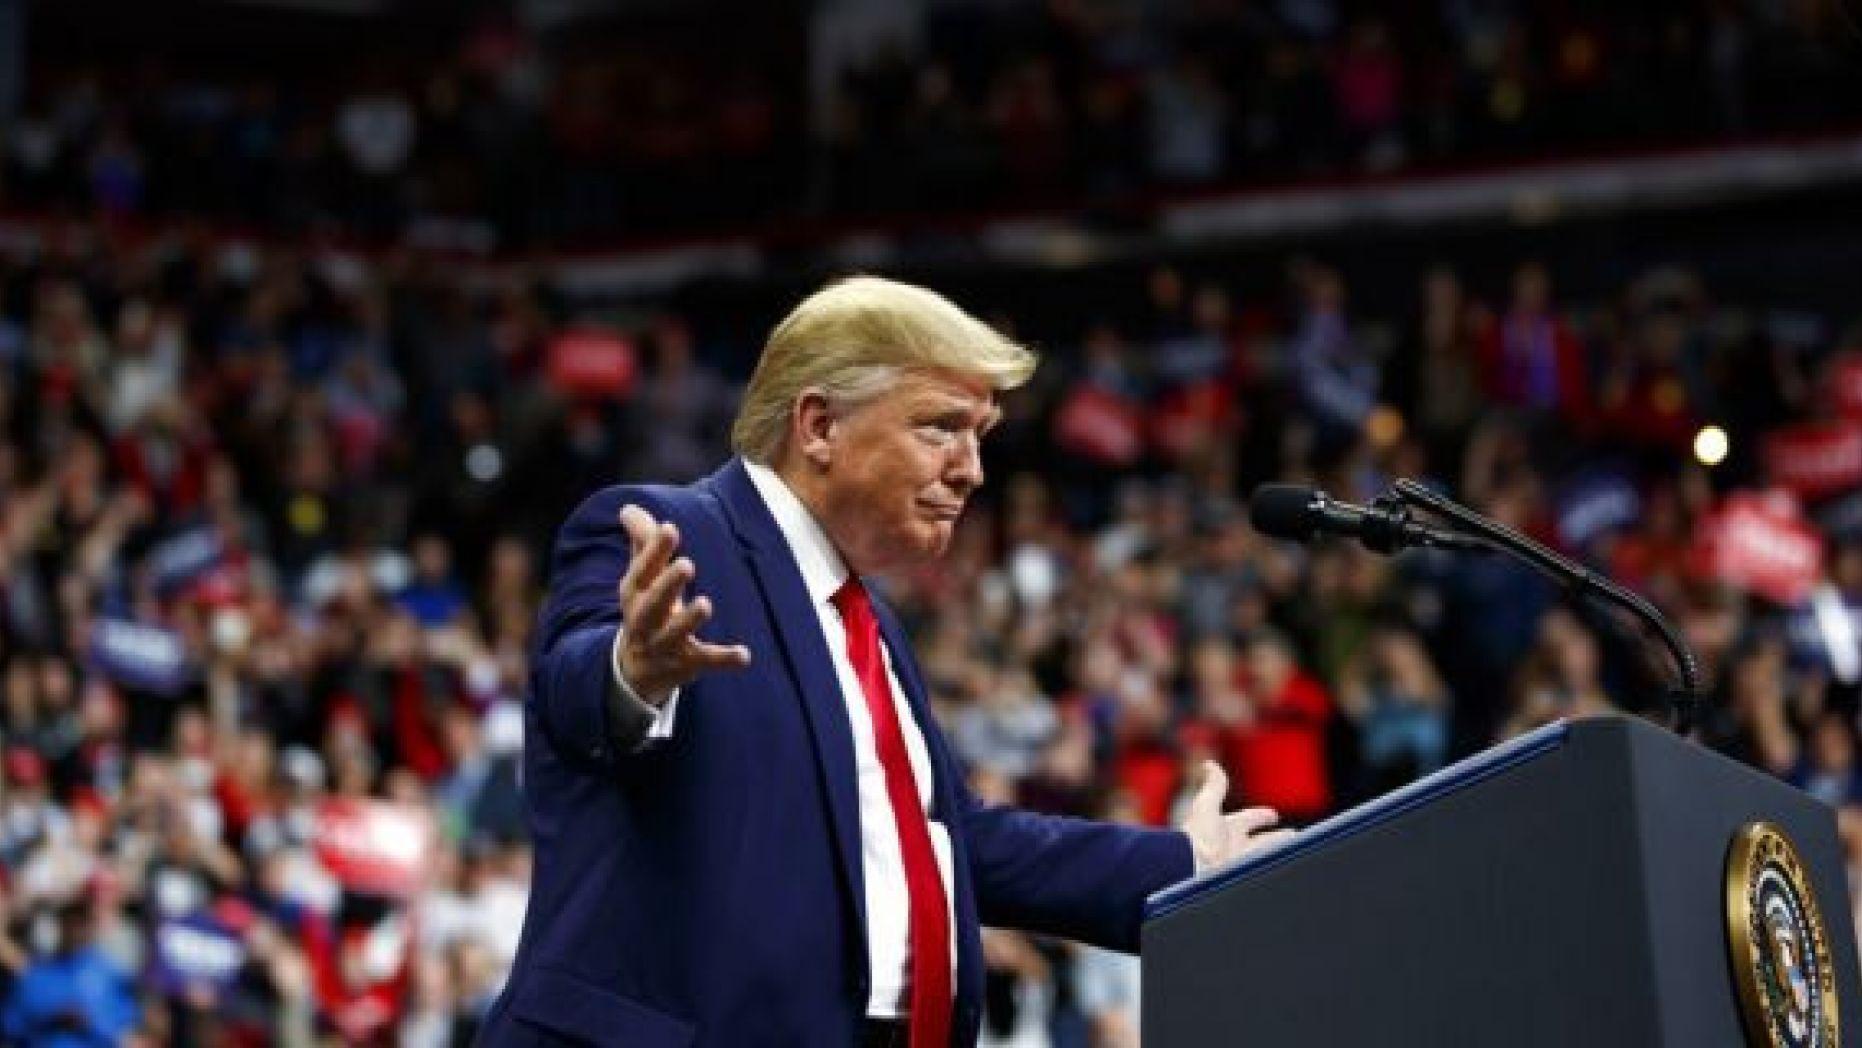 Trump Harangues Biden at Chaotic Rally in Minneapolis